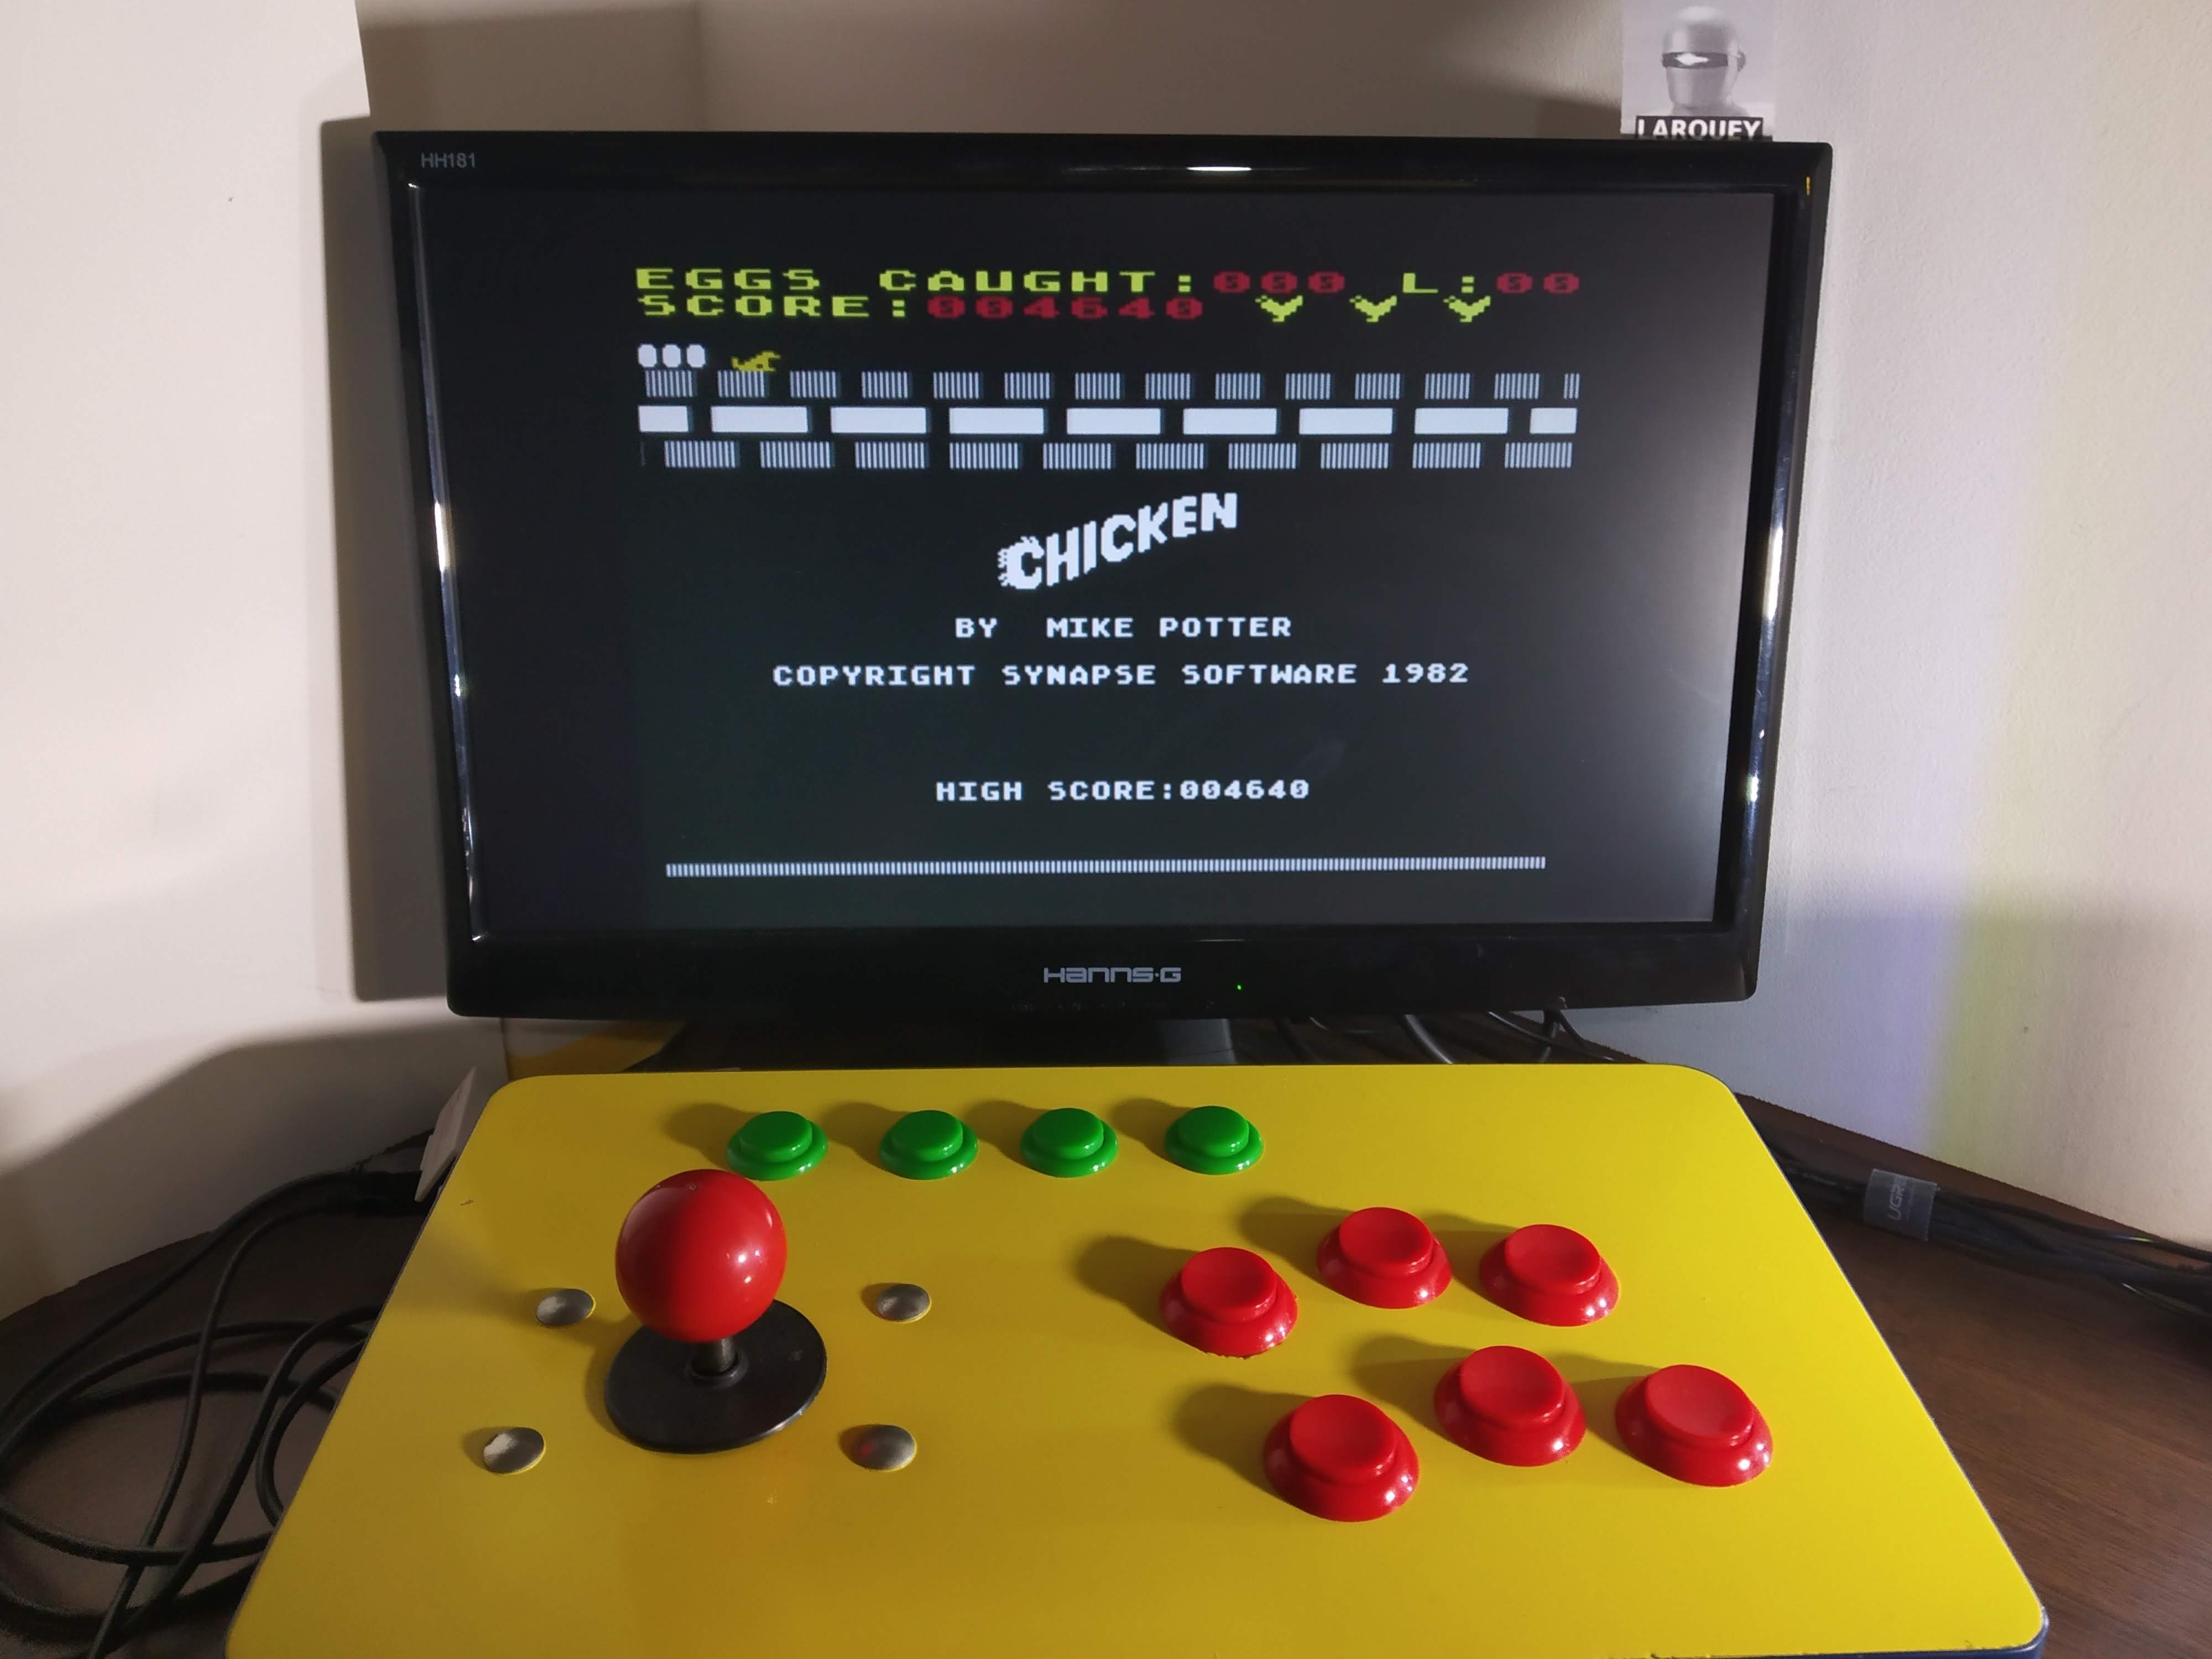 Larquey: Chicken (Atari 400/800/XL/XE Emulated) 4,640 points on 2020-01-02 08:29:39